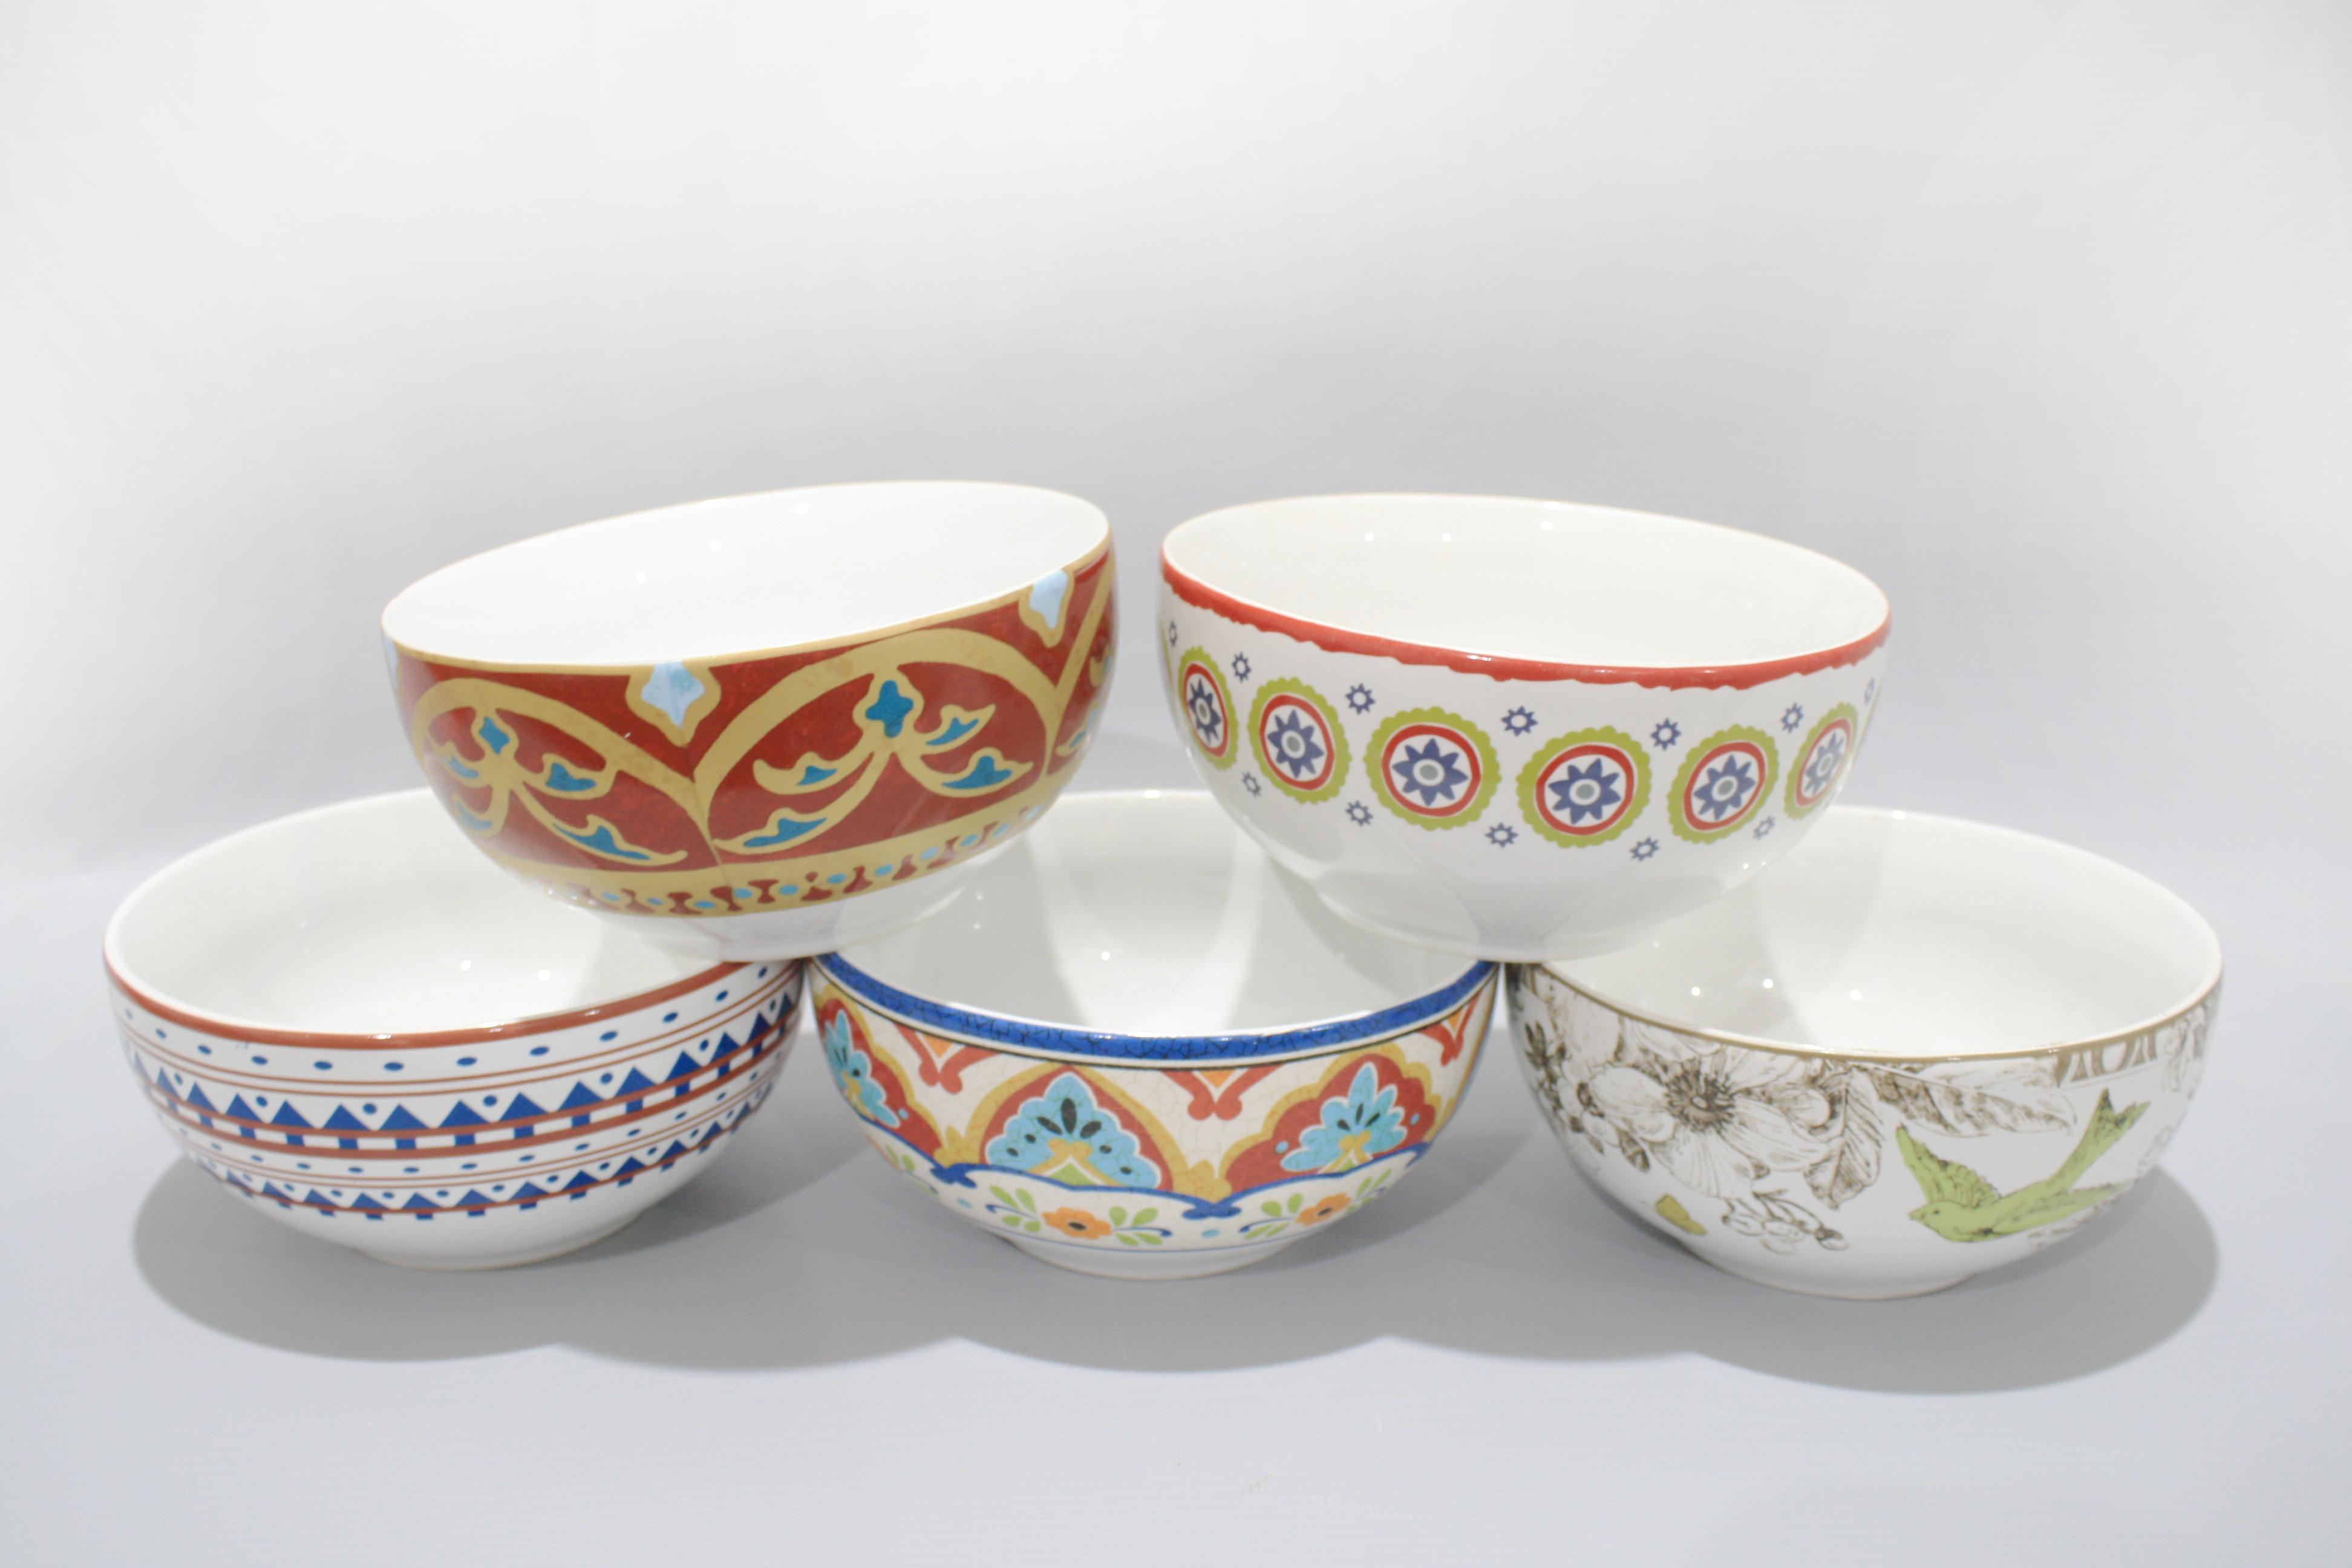 Bowl Marocco